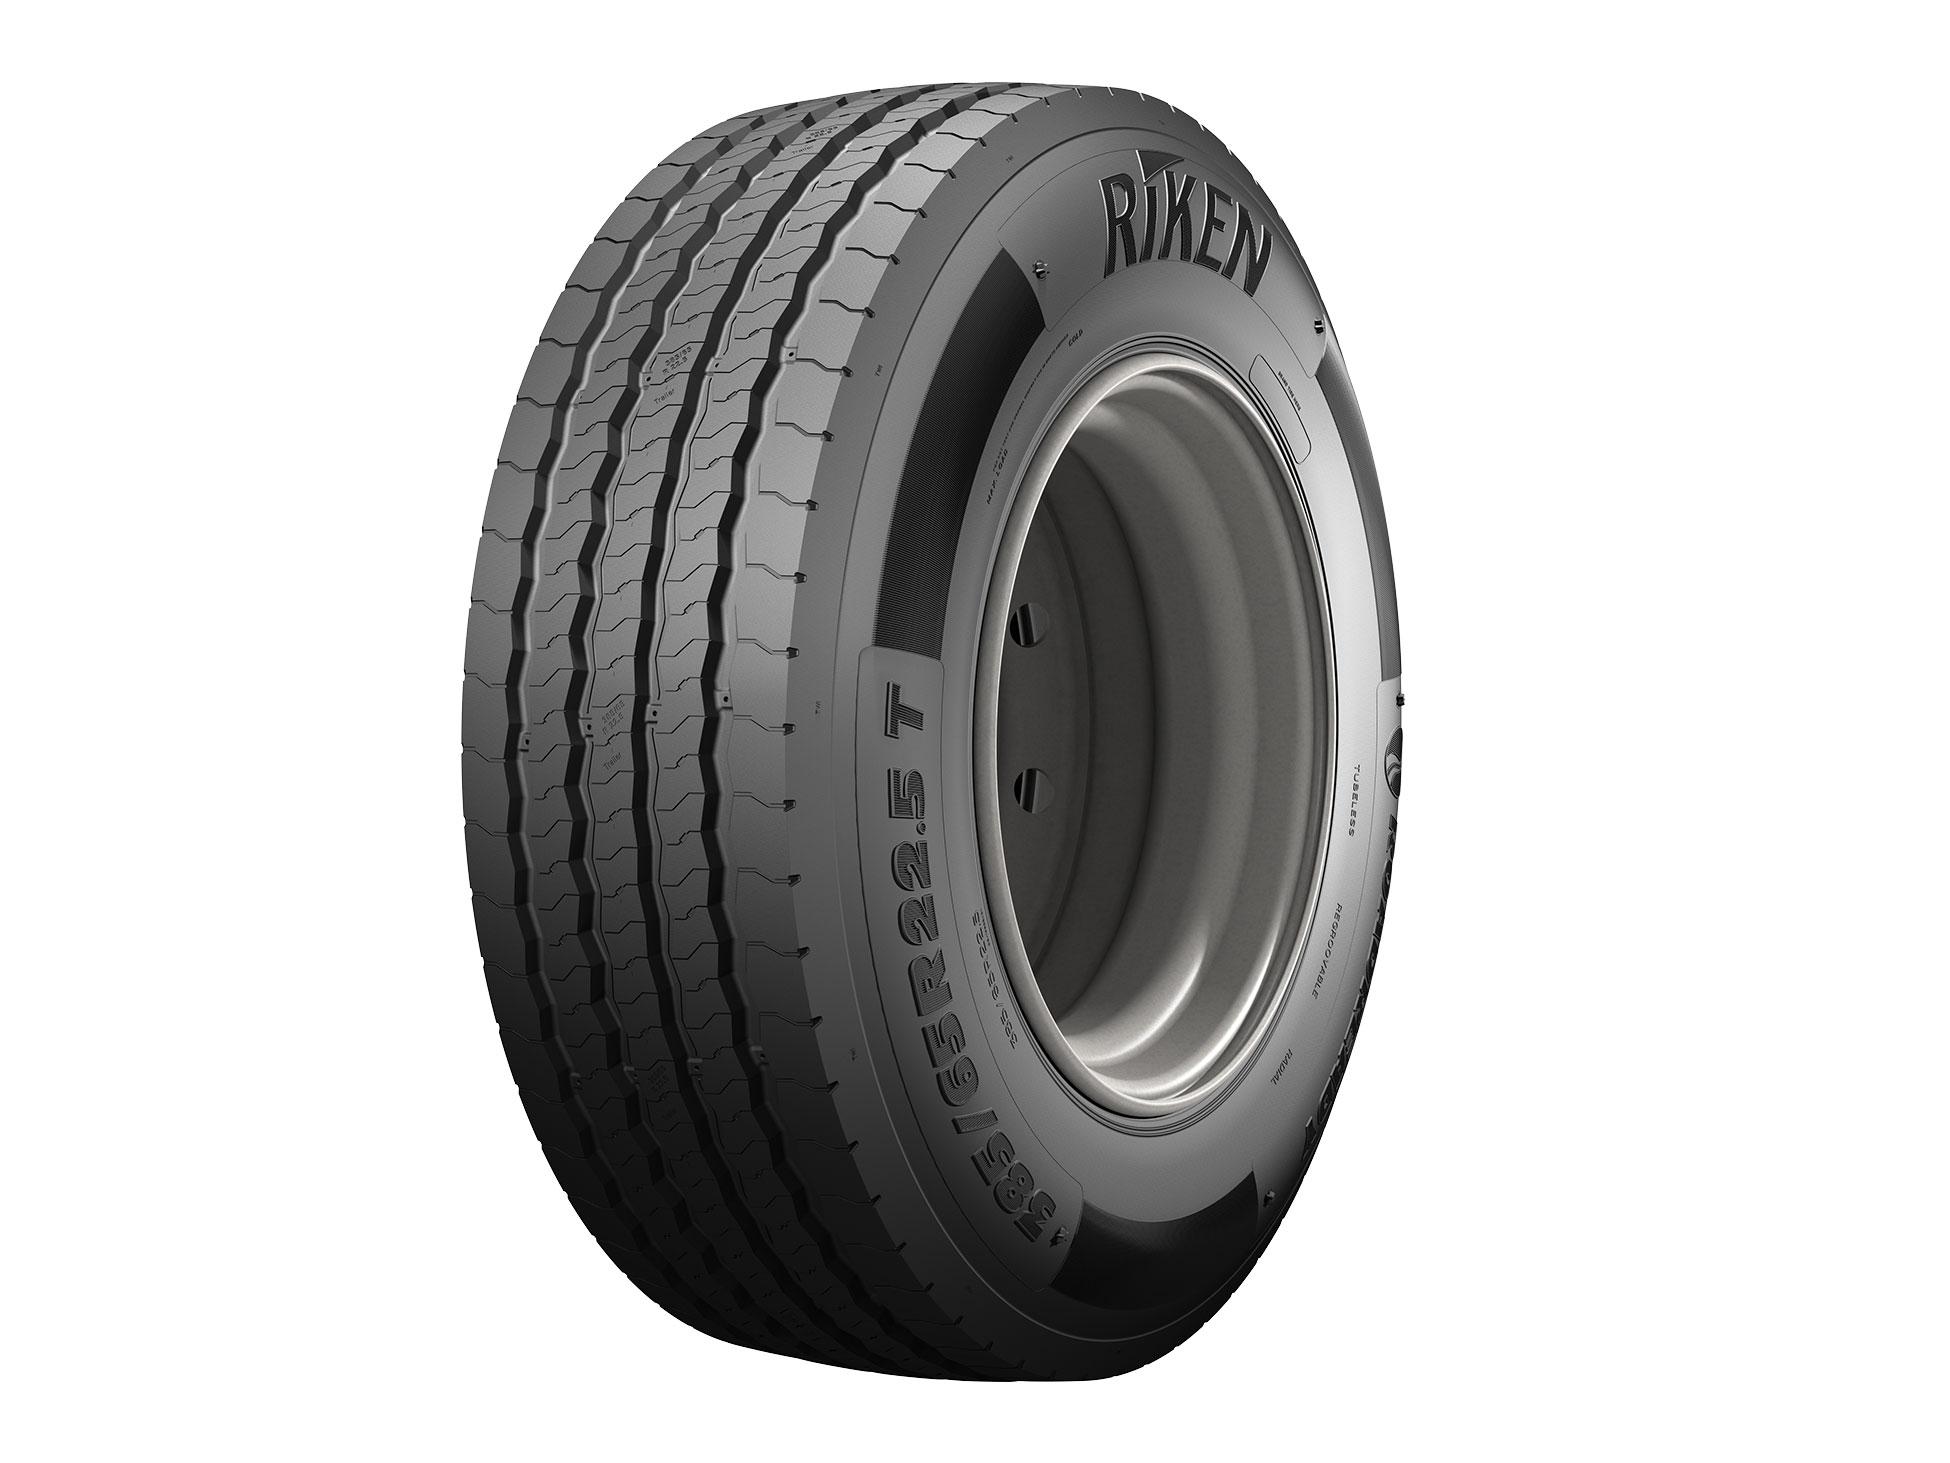 RIKEN--38565-R-225-ROADREADY-T-160-K--Tehergepkocsi-potkocsi-gumi-